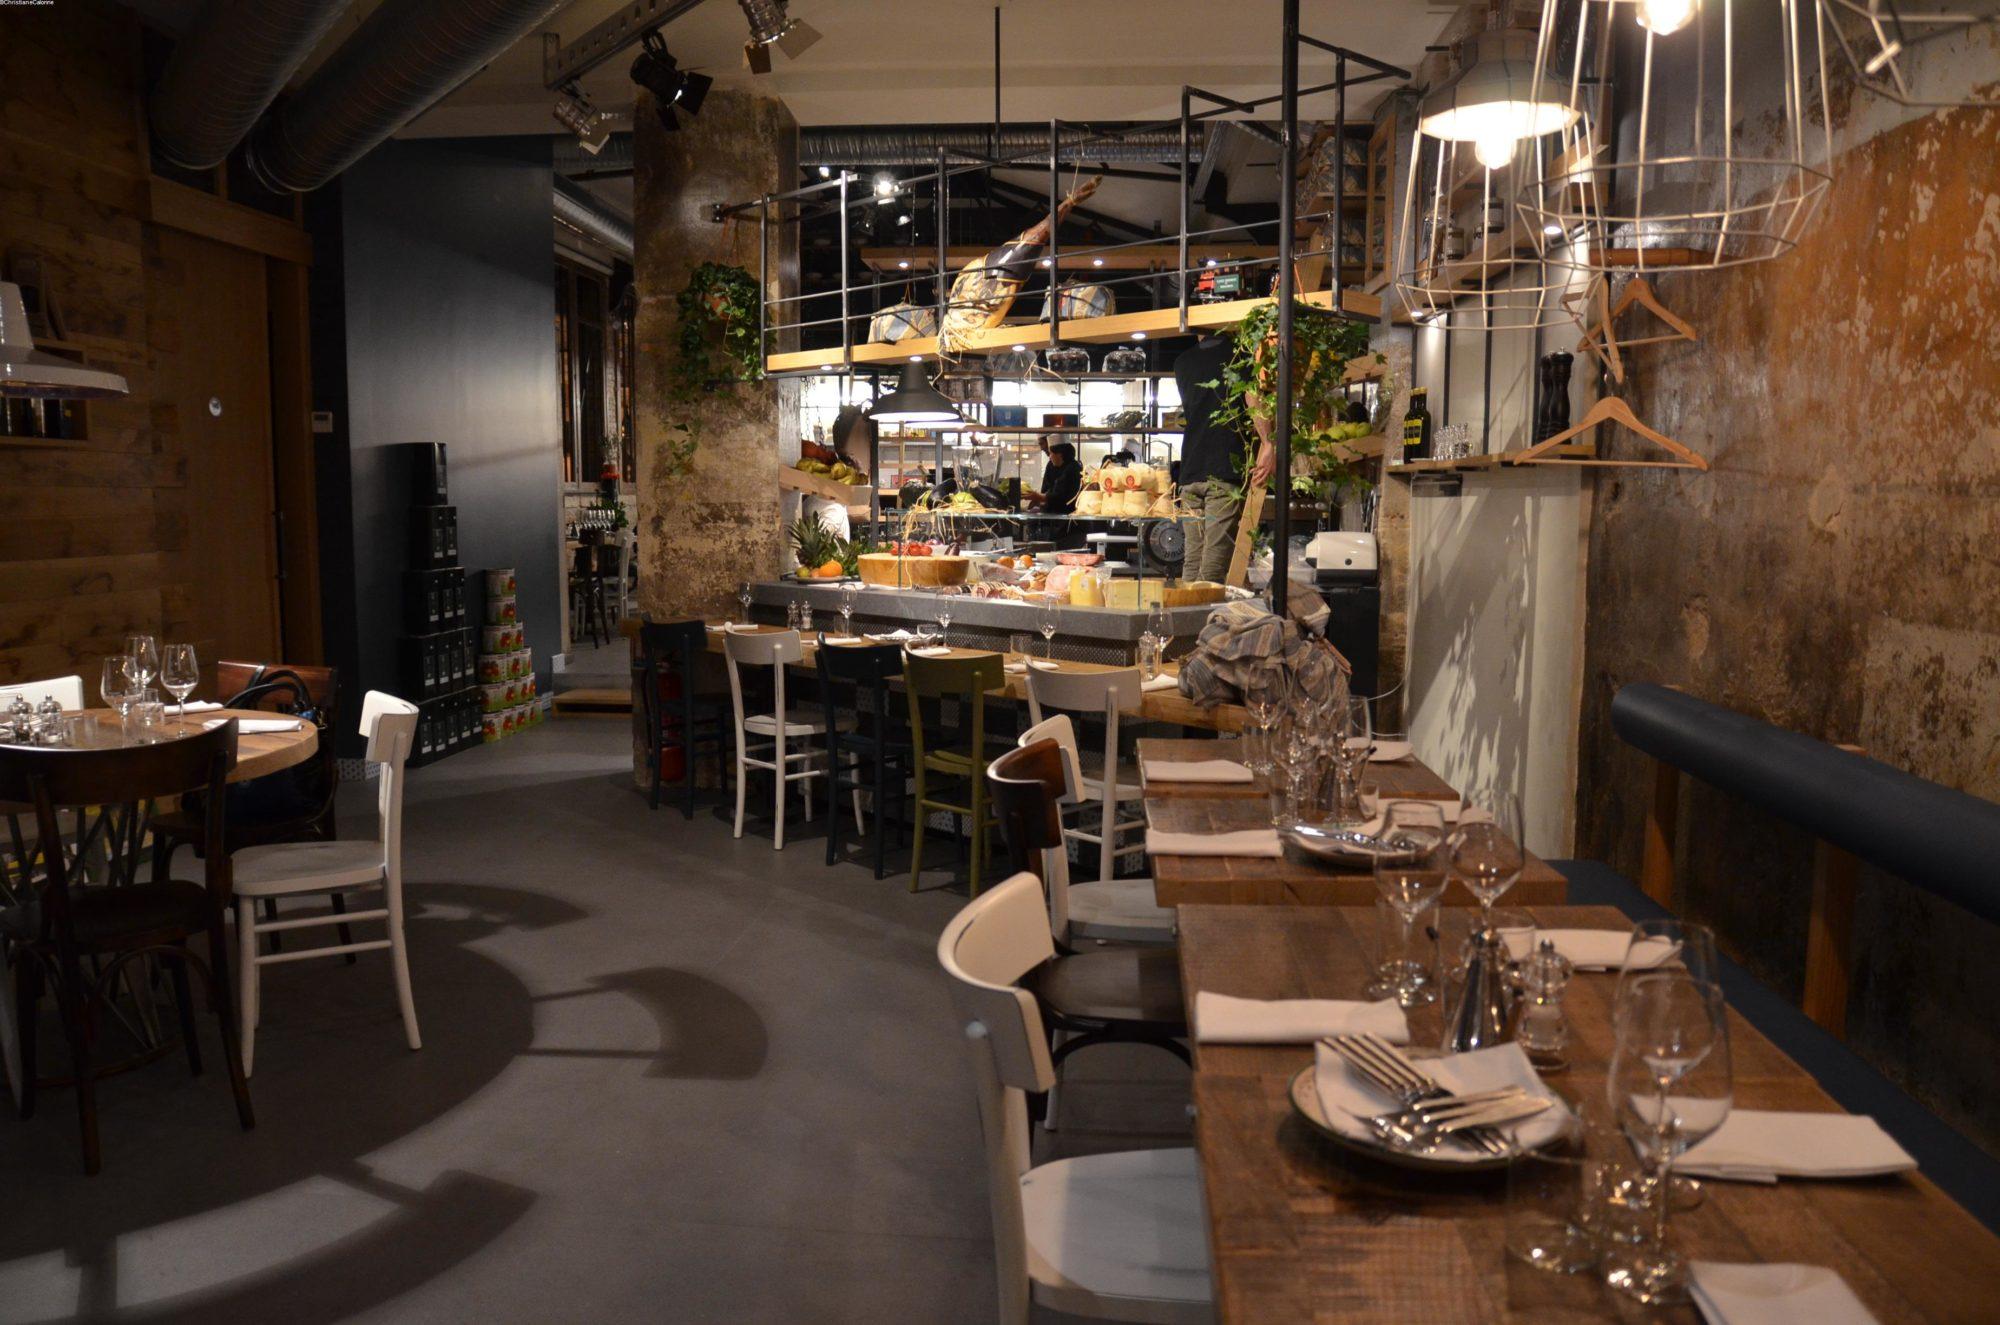 http://illum.it/wp-content/uploads/2019/06/3-Restaurant-Les-Amis-des-Messina-SchiticchiataTerroirEvasion.com_c2i-e1560264314540.jpg